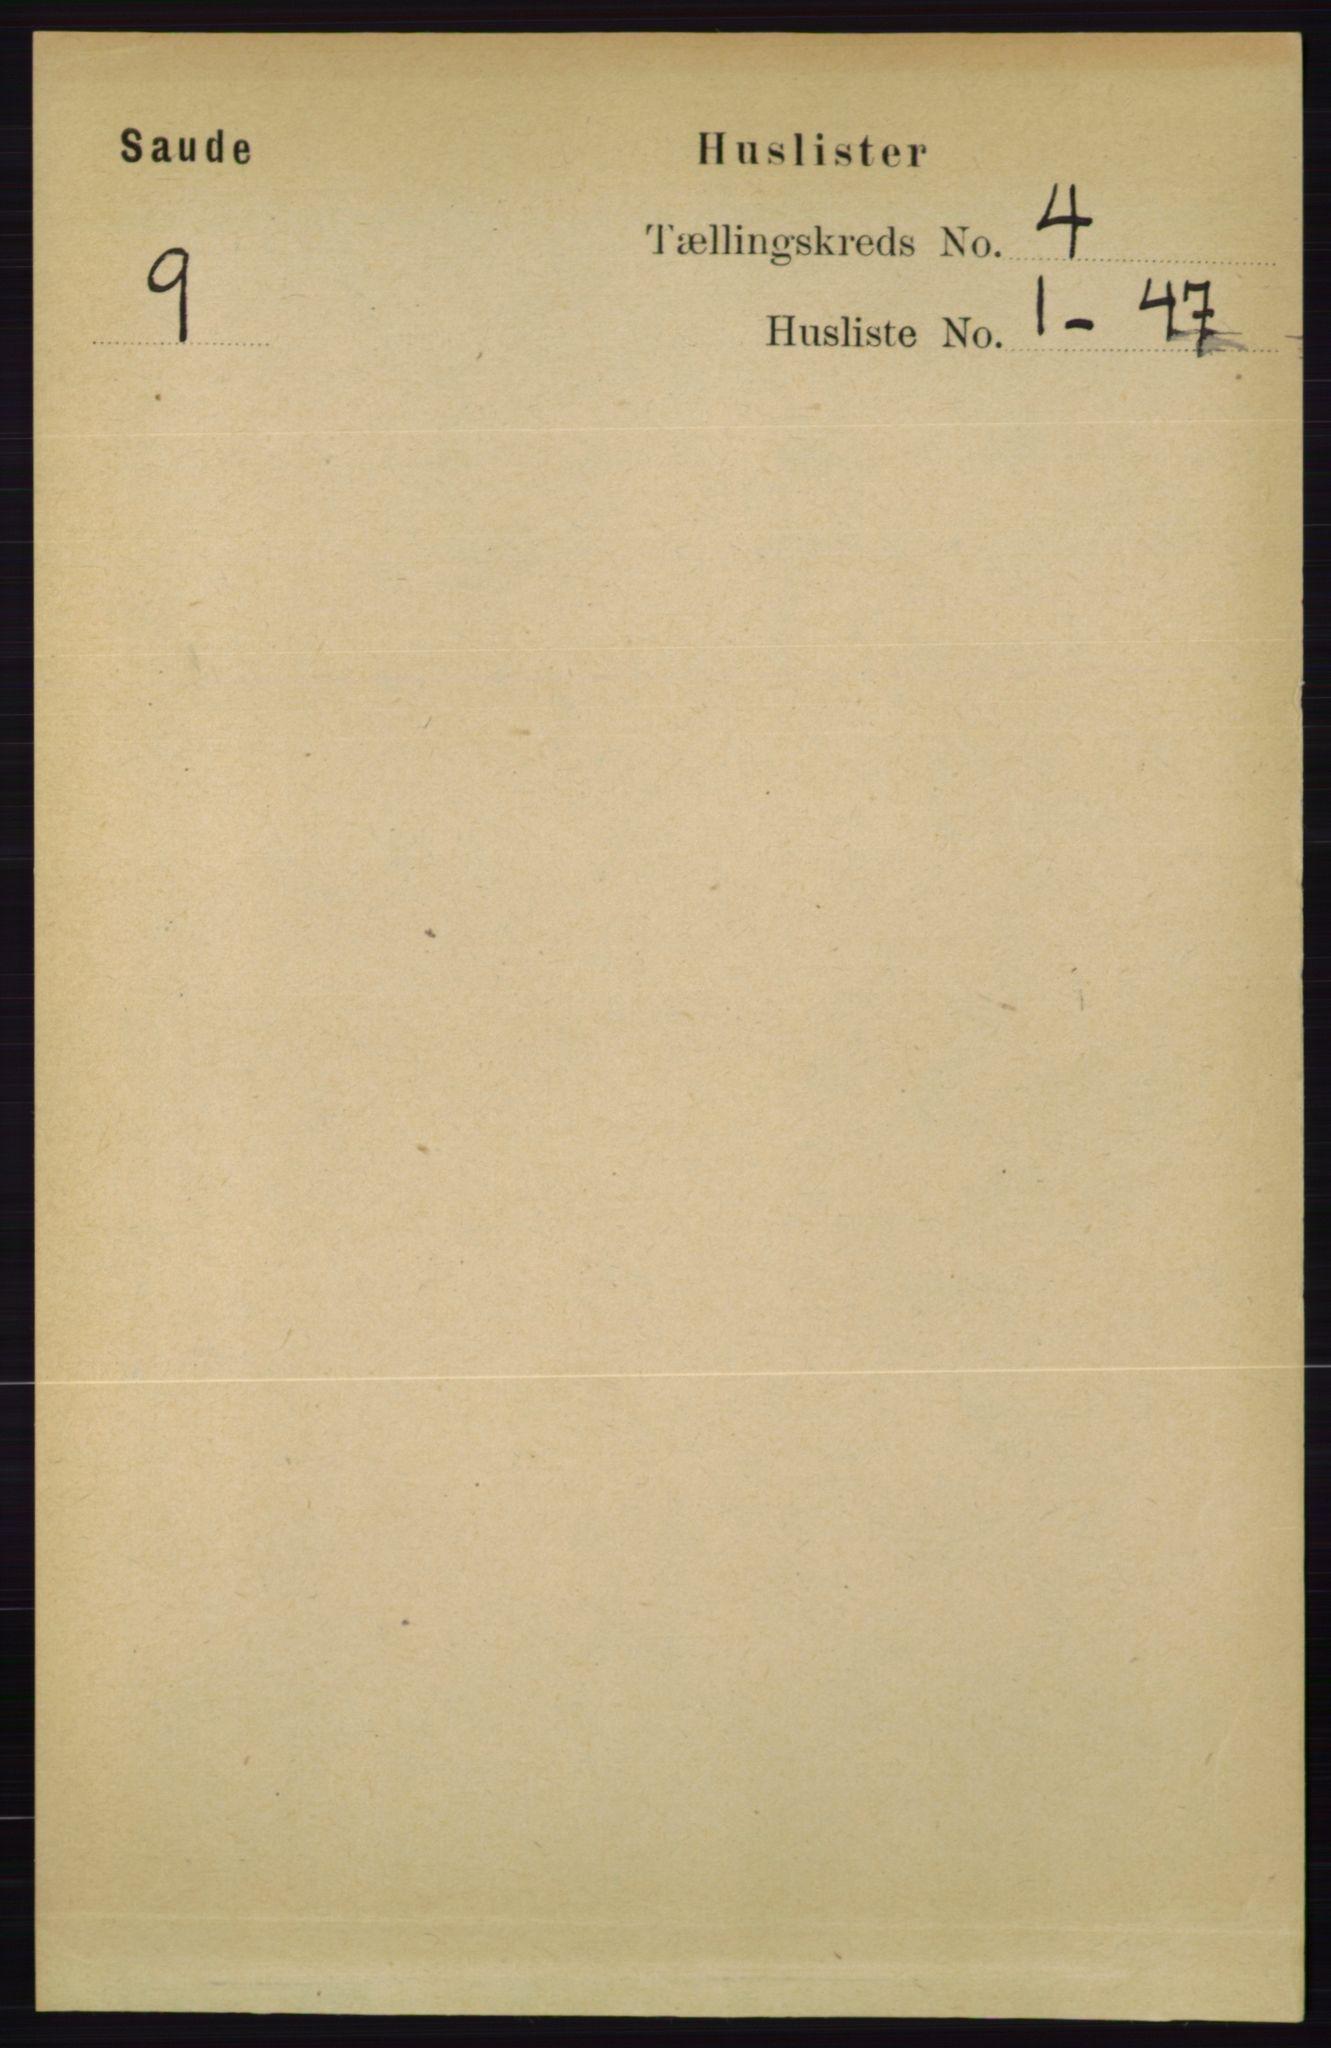 RA, Folketelling 1891 for 0822 Sauherad herred, 1891, s. 1046